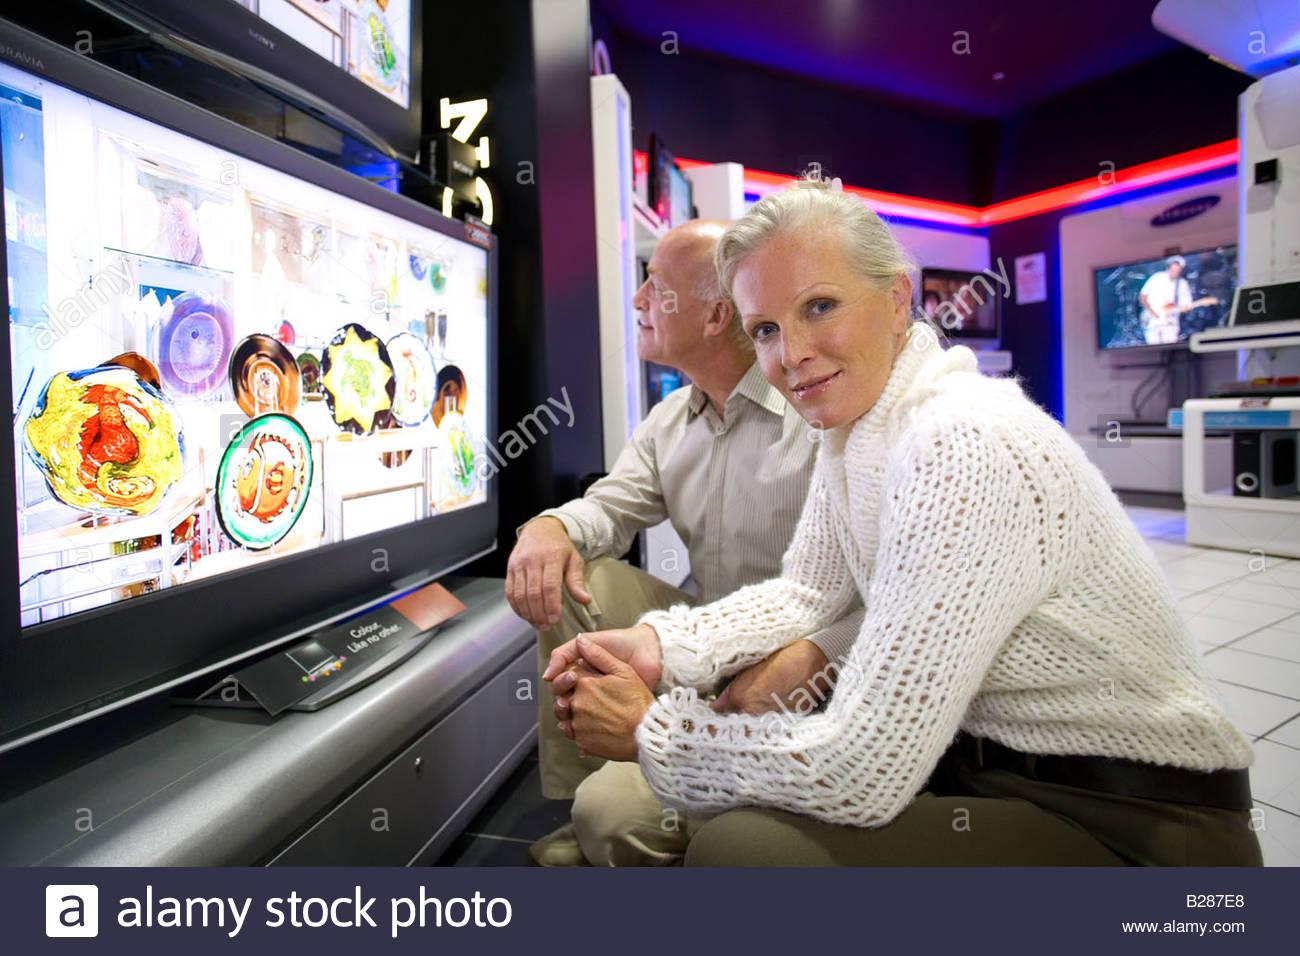 Älteres Paar mit Flachbildschirm im Elektronik-Shop, Portrait Frau Stockbild